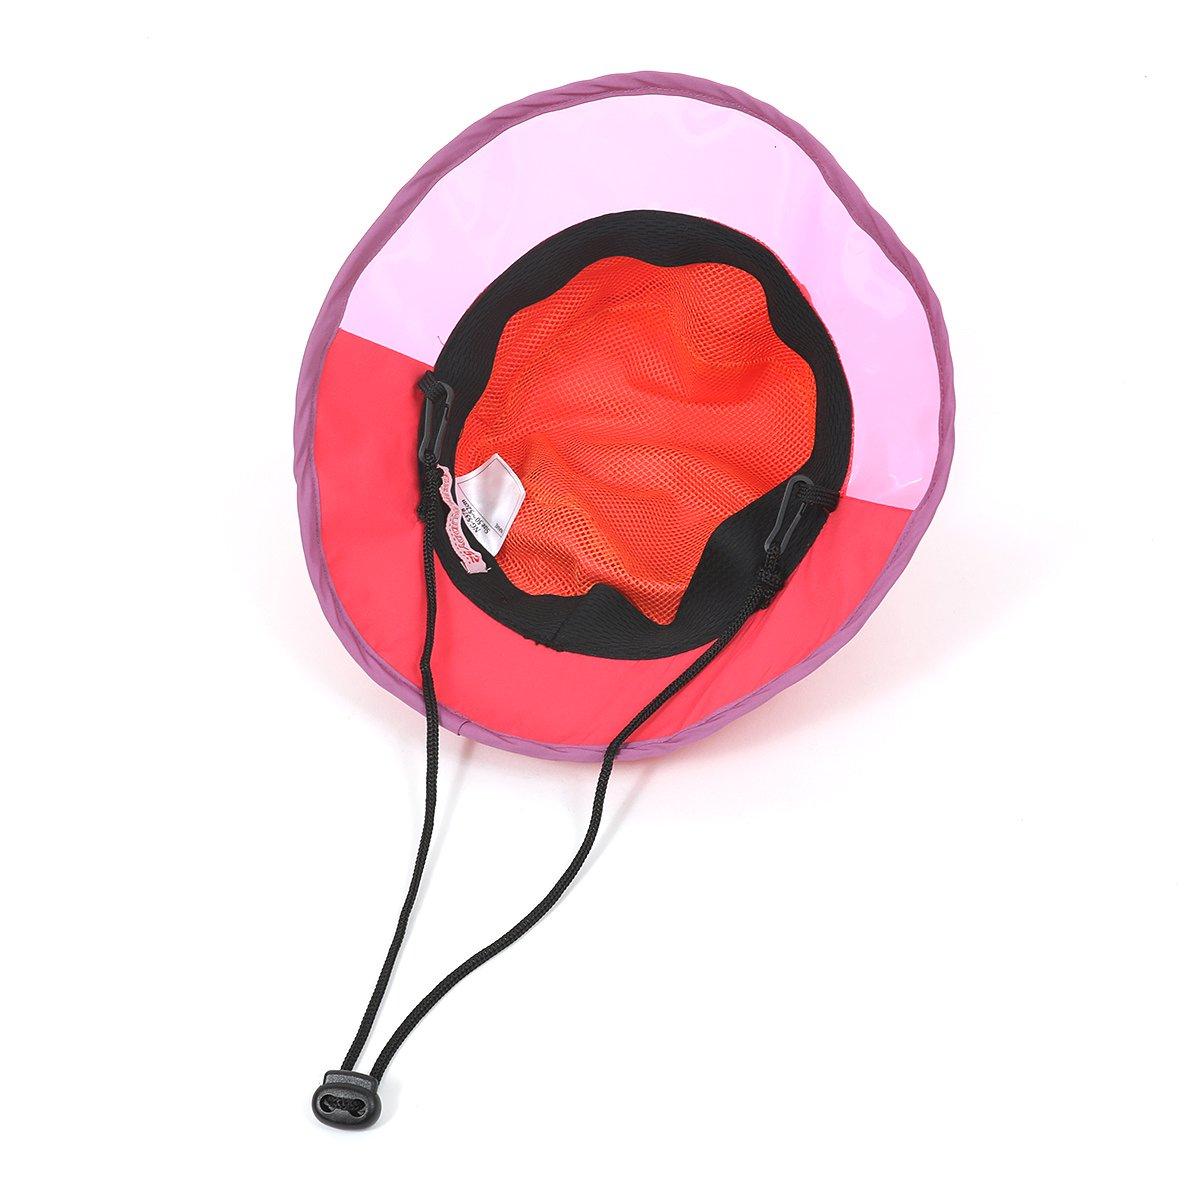 【BABY】Baby Rain PVC Hat 詳細画像7